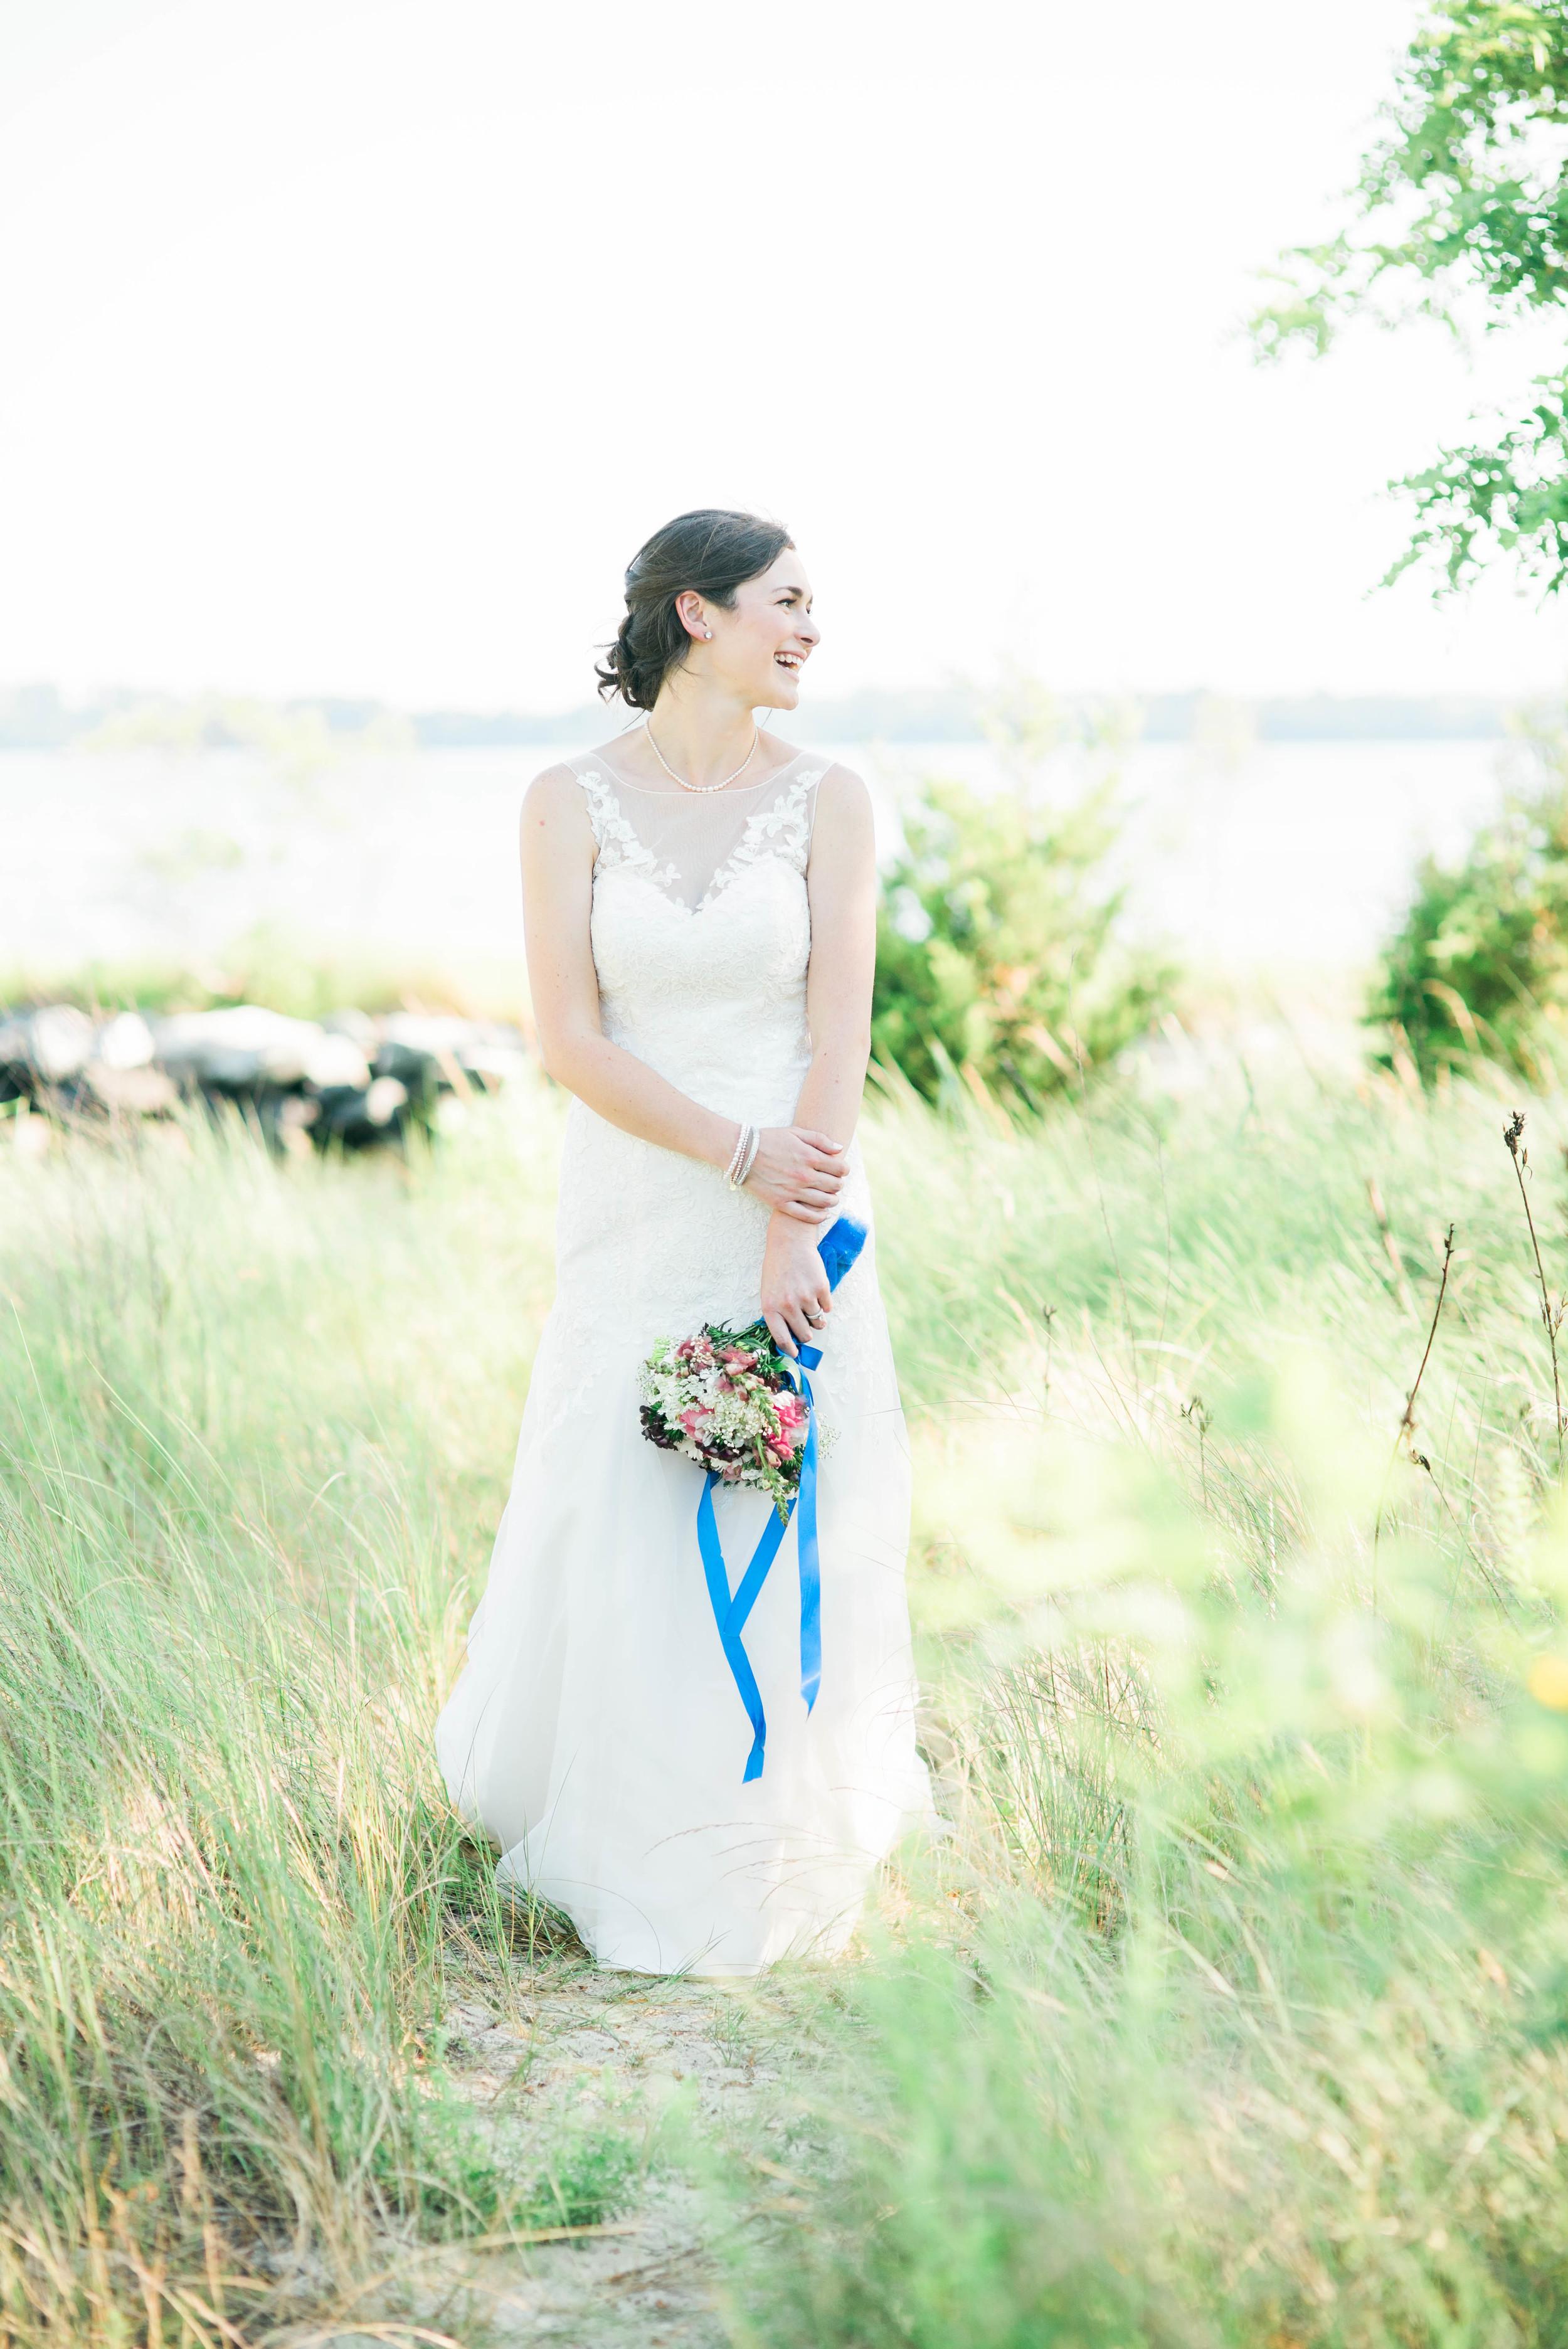 PREVIEWremowedding2016-54.jpg